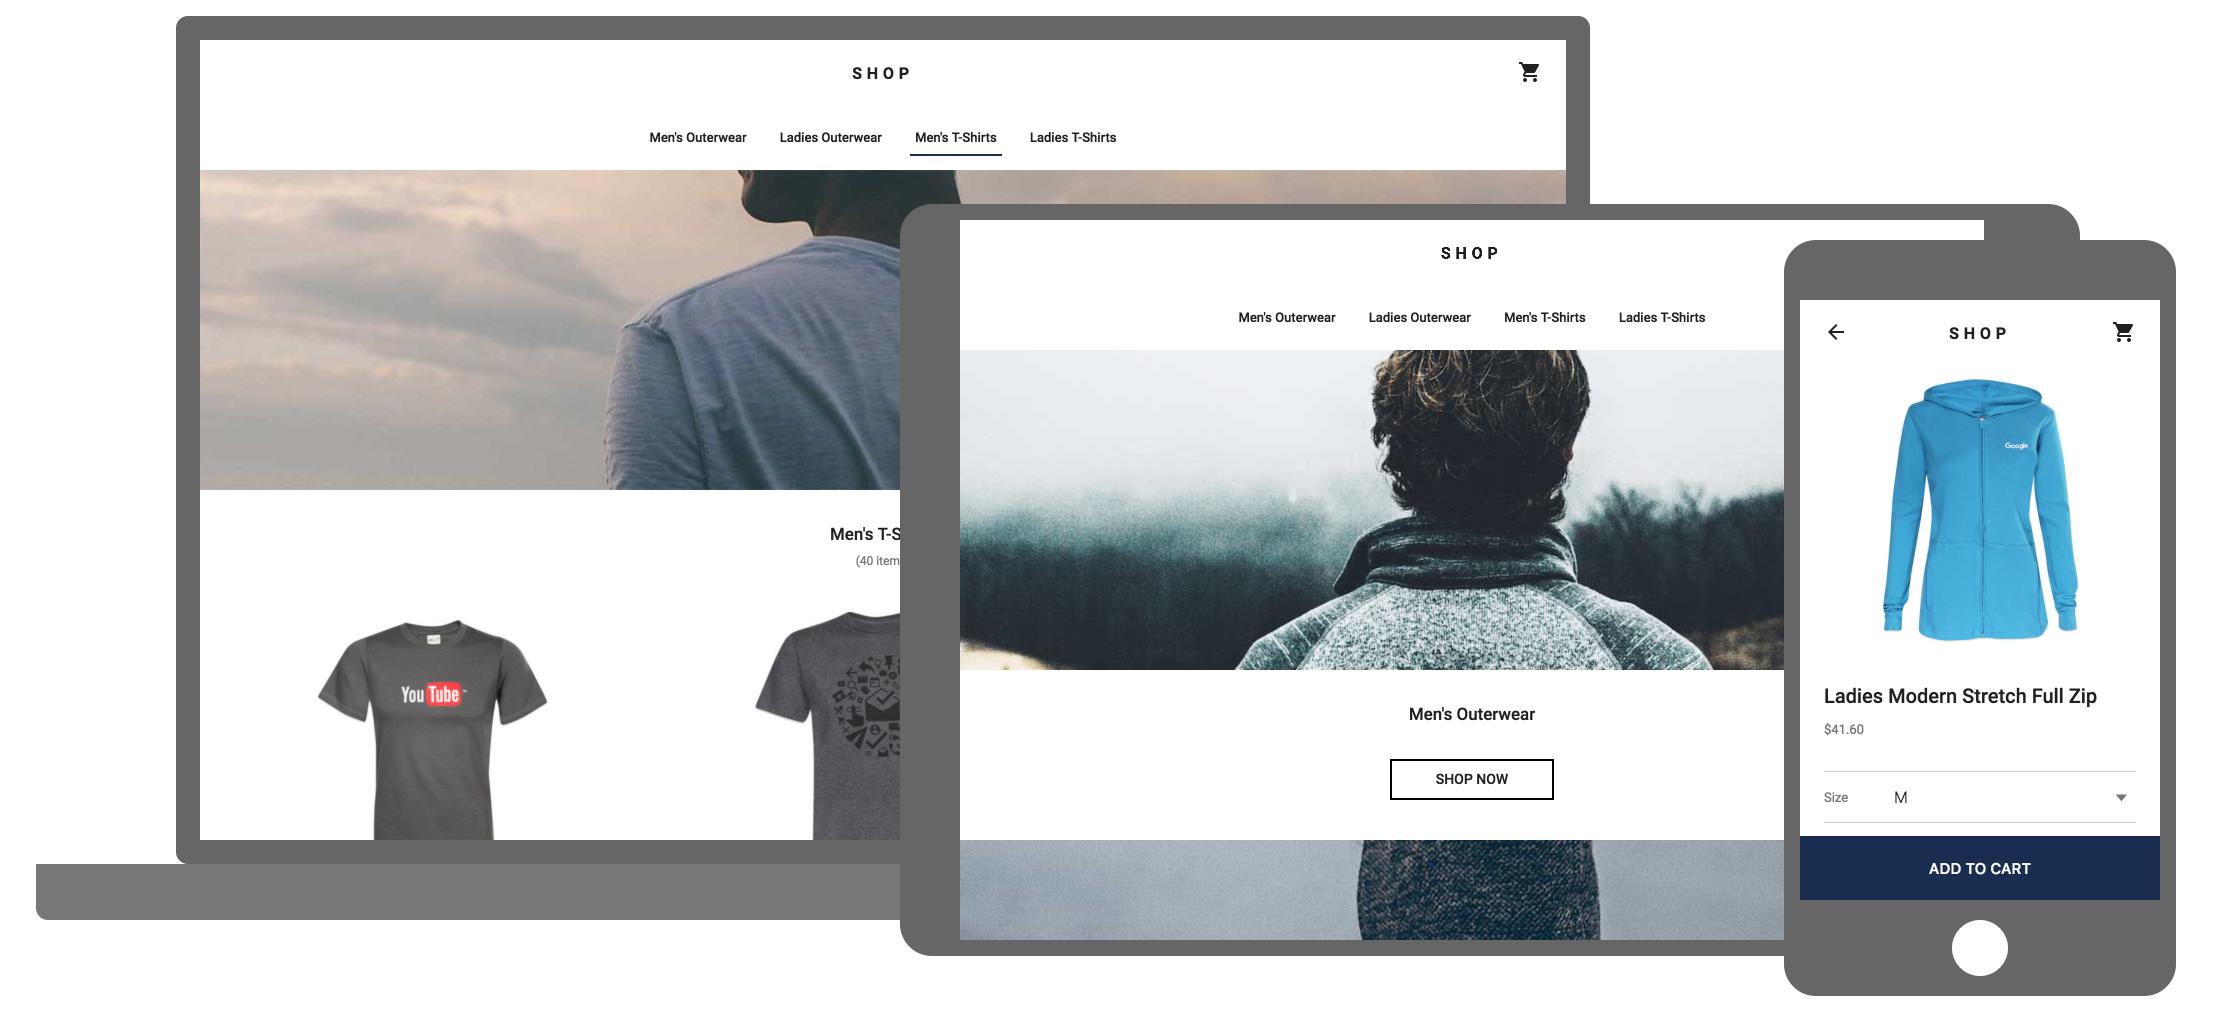 GitHub - Polymer/shop: The Shop app